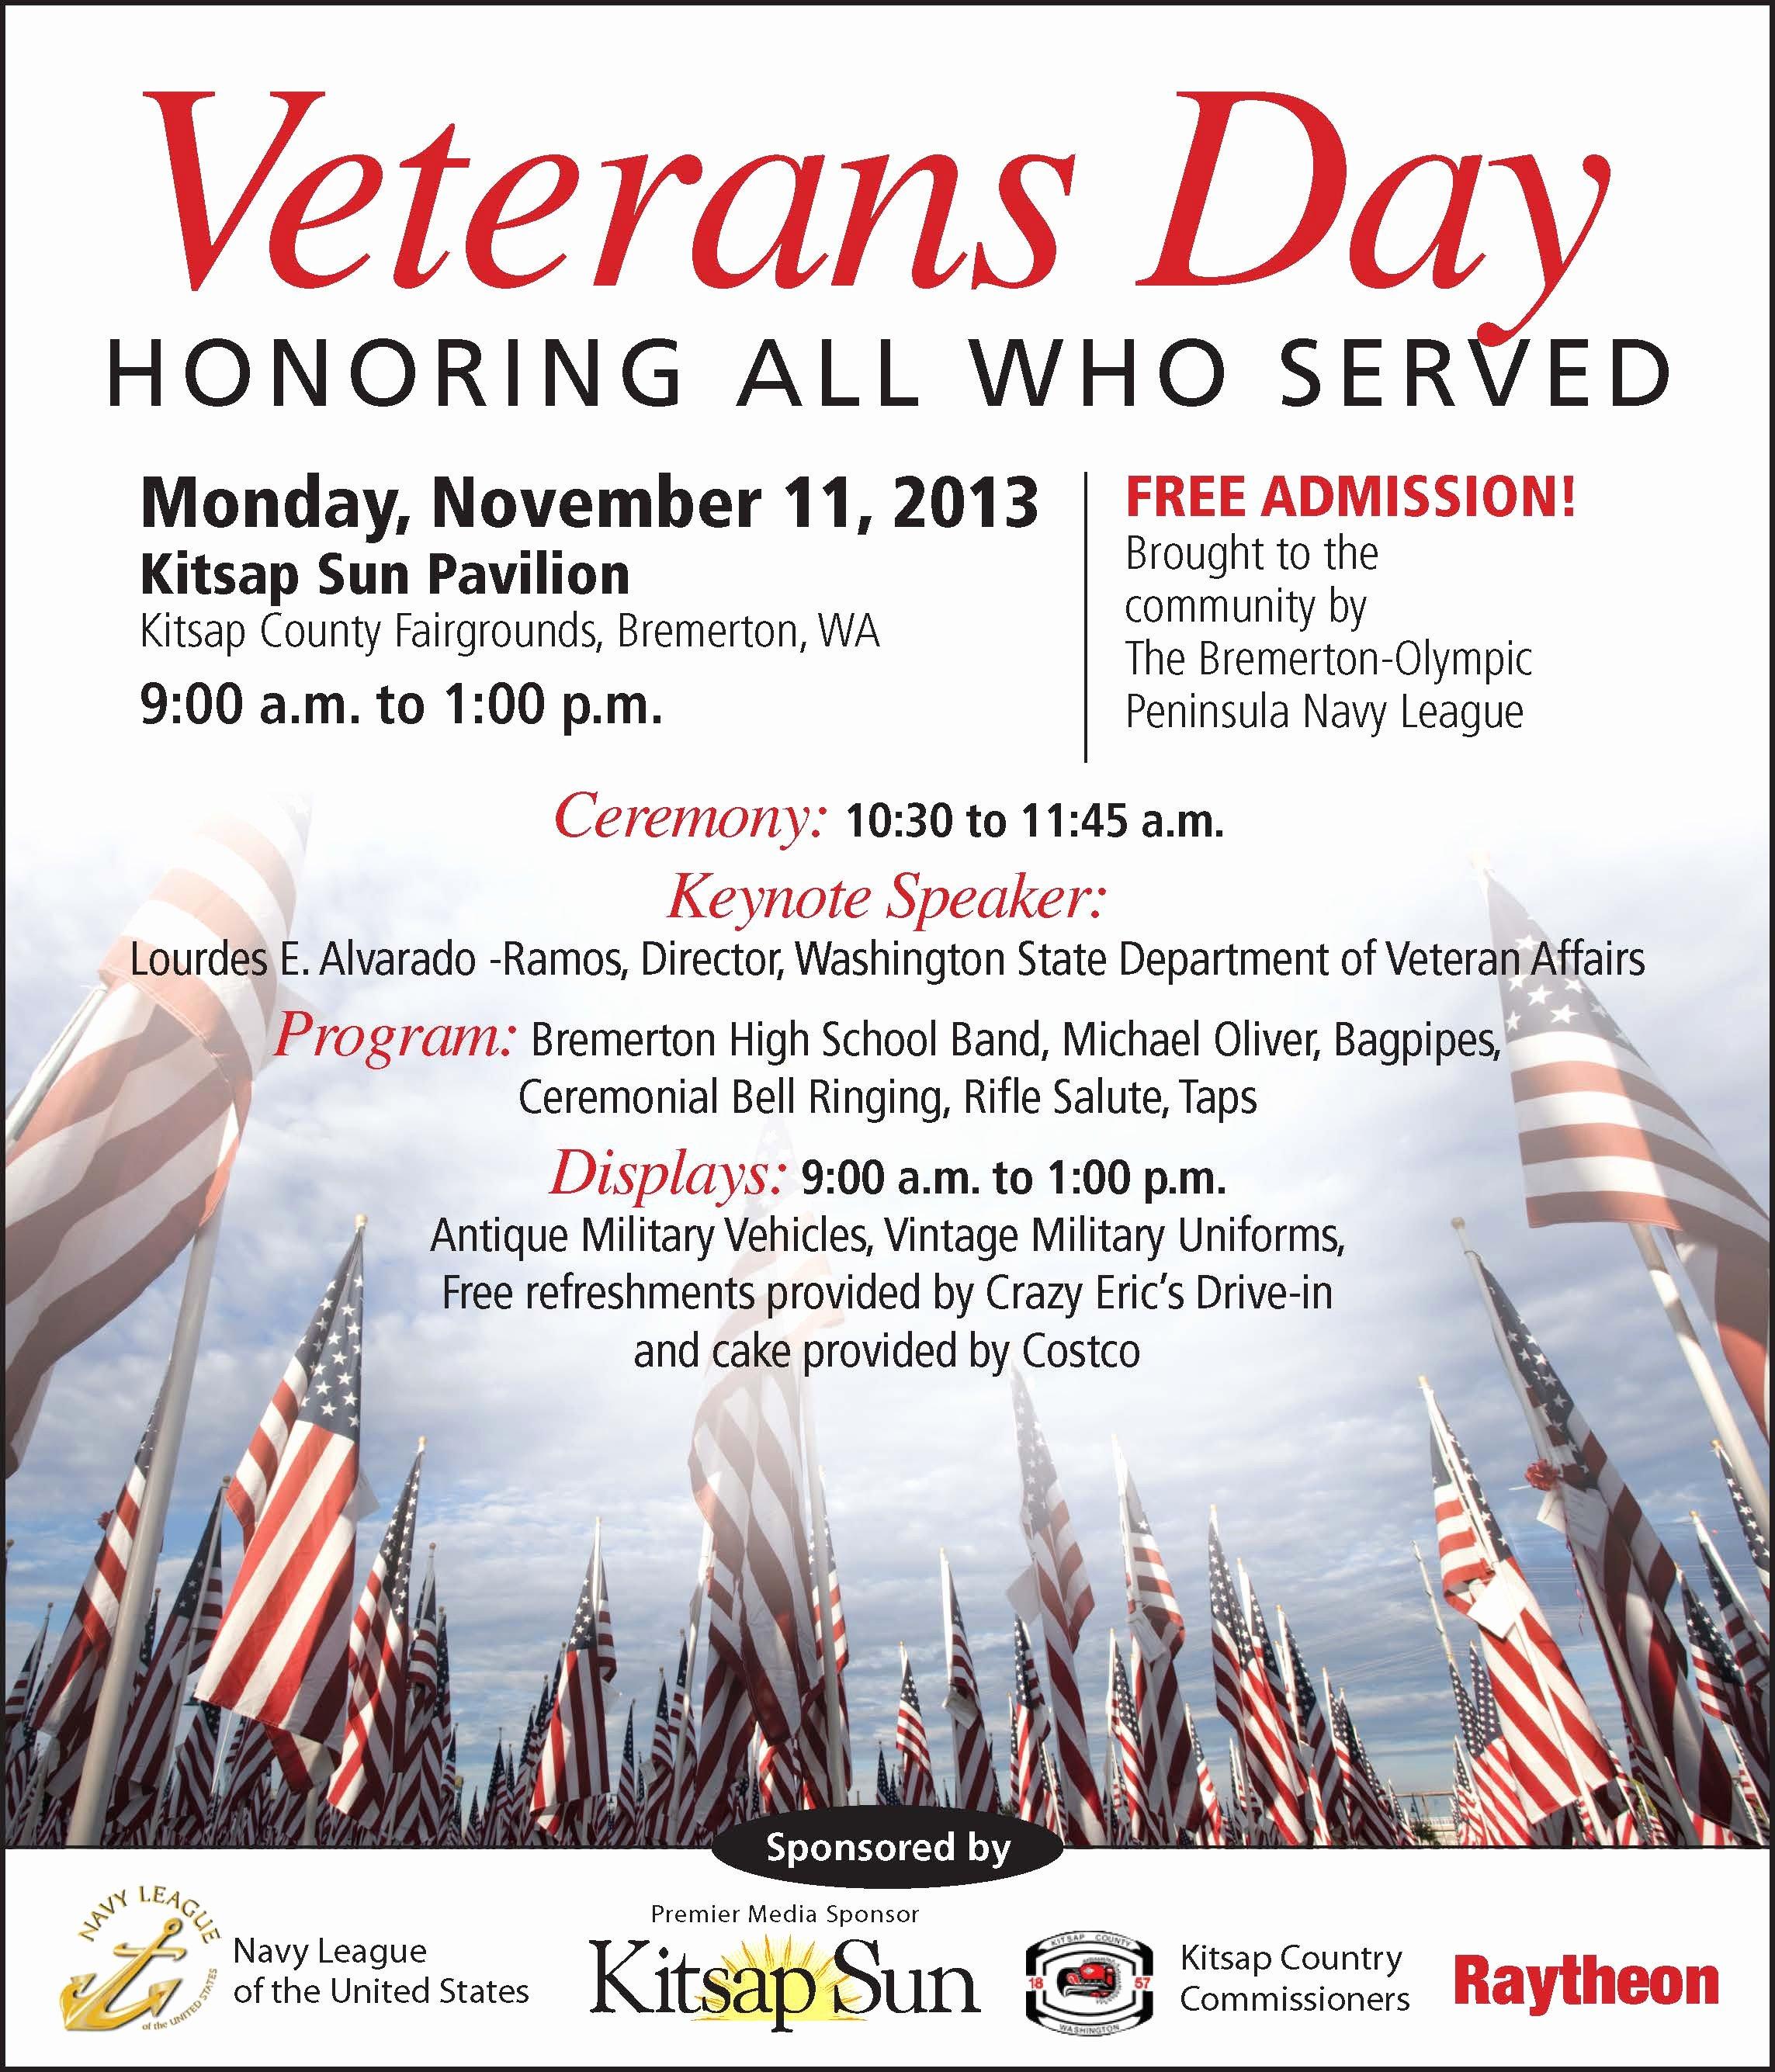 Veterans Day Flyer Template Free Best Of Nov 11 Veterans Day Ceremony